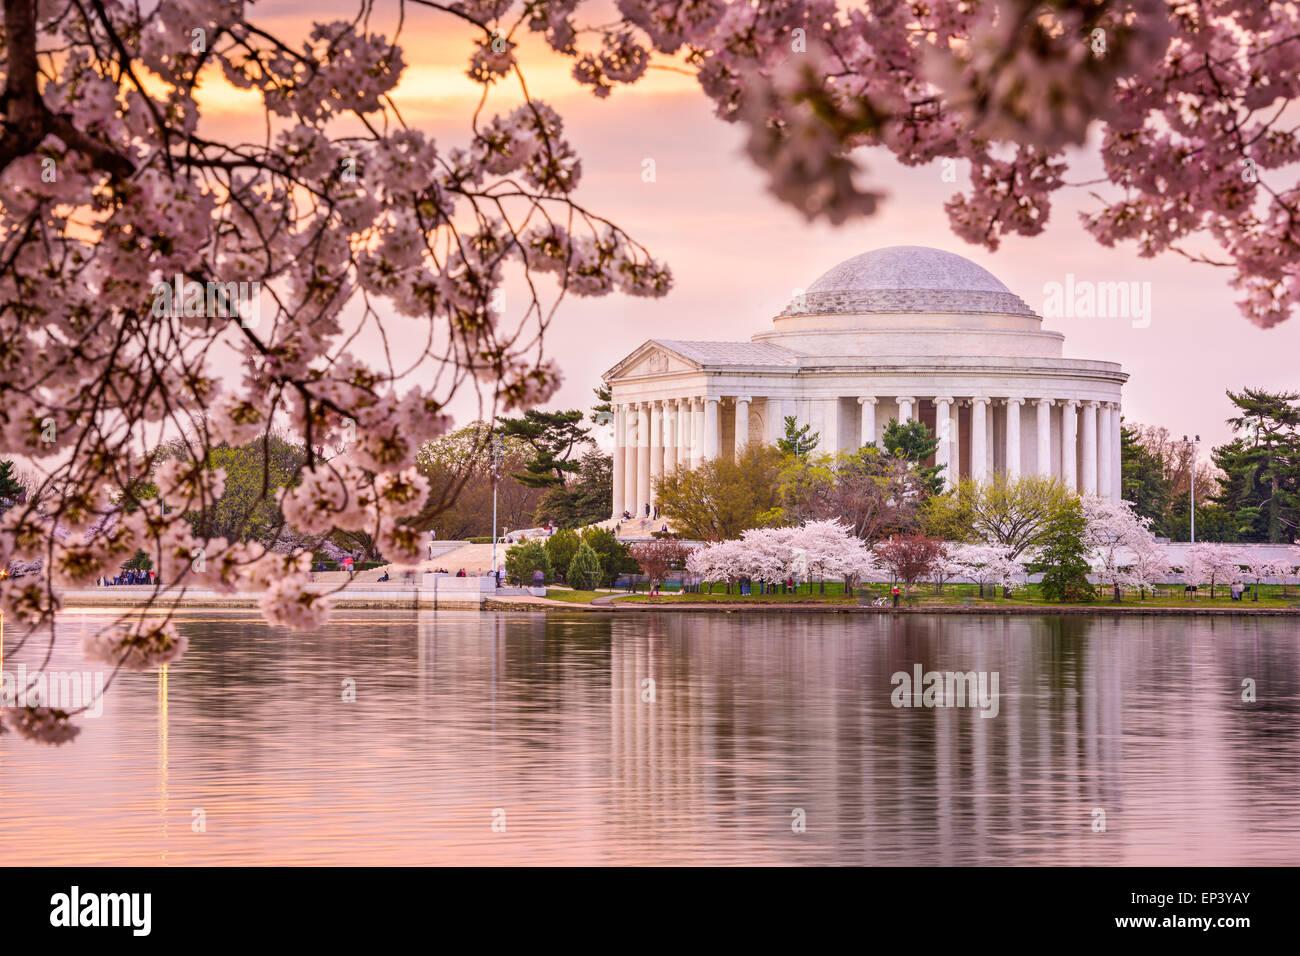 Washington, DC am Tidal Basin und Jefferson Memorial im Frühjahr. Stockbild